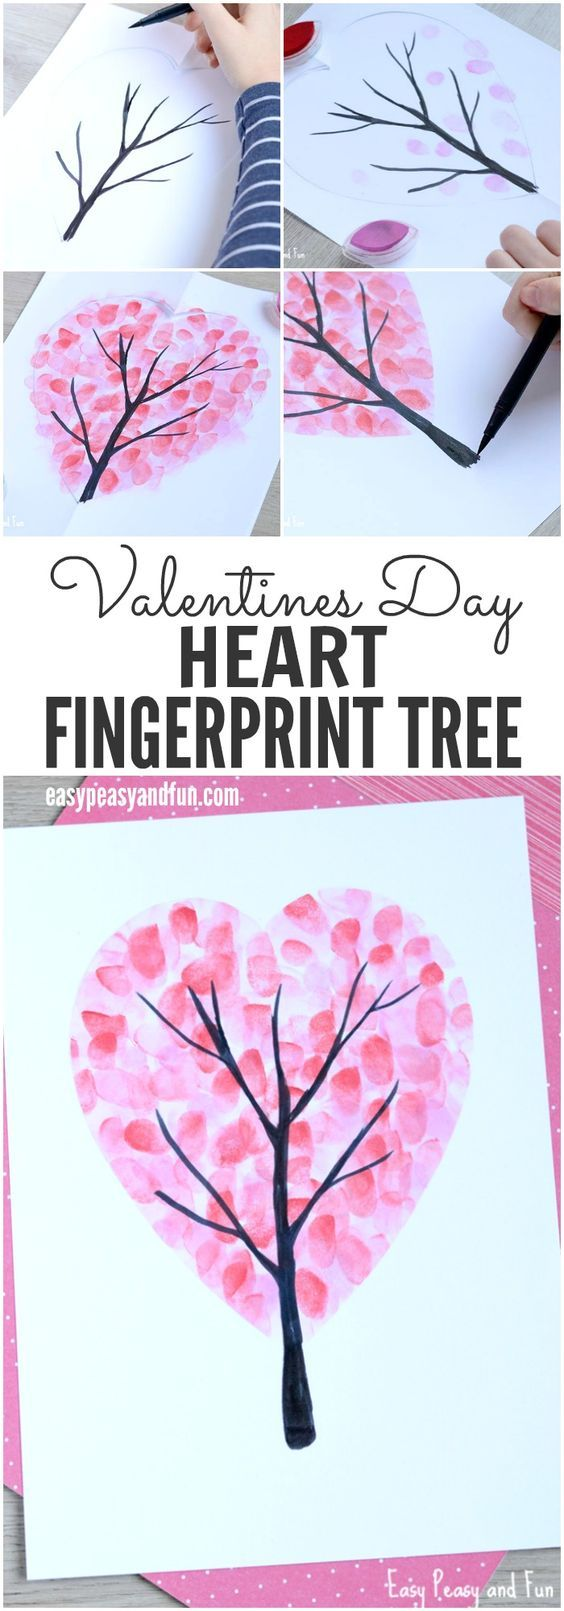 DIY Craft: Valentines Day Heart Fingerprint Tree Craft 1